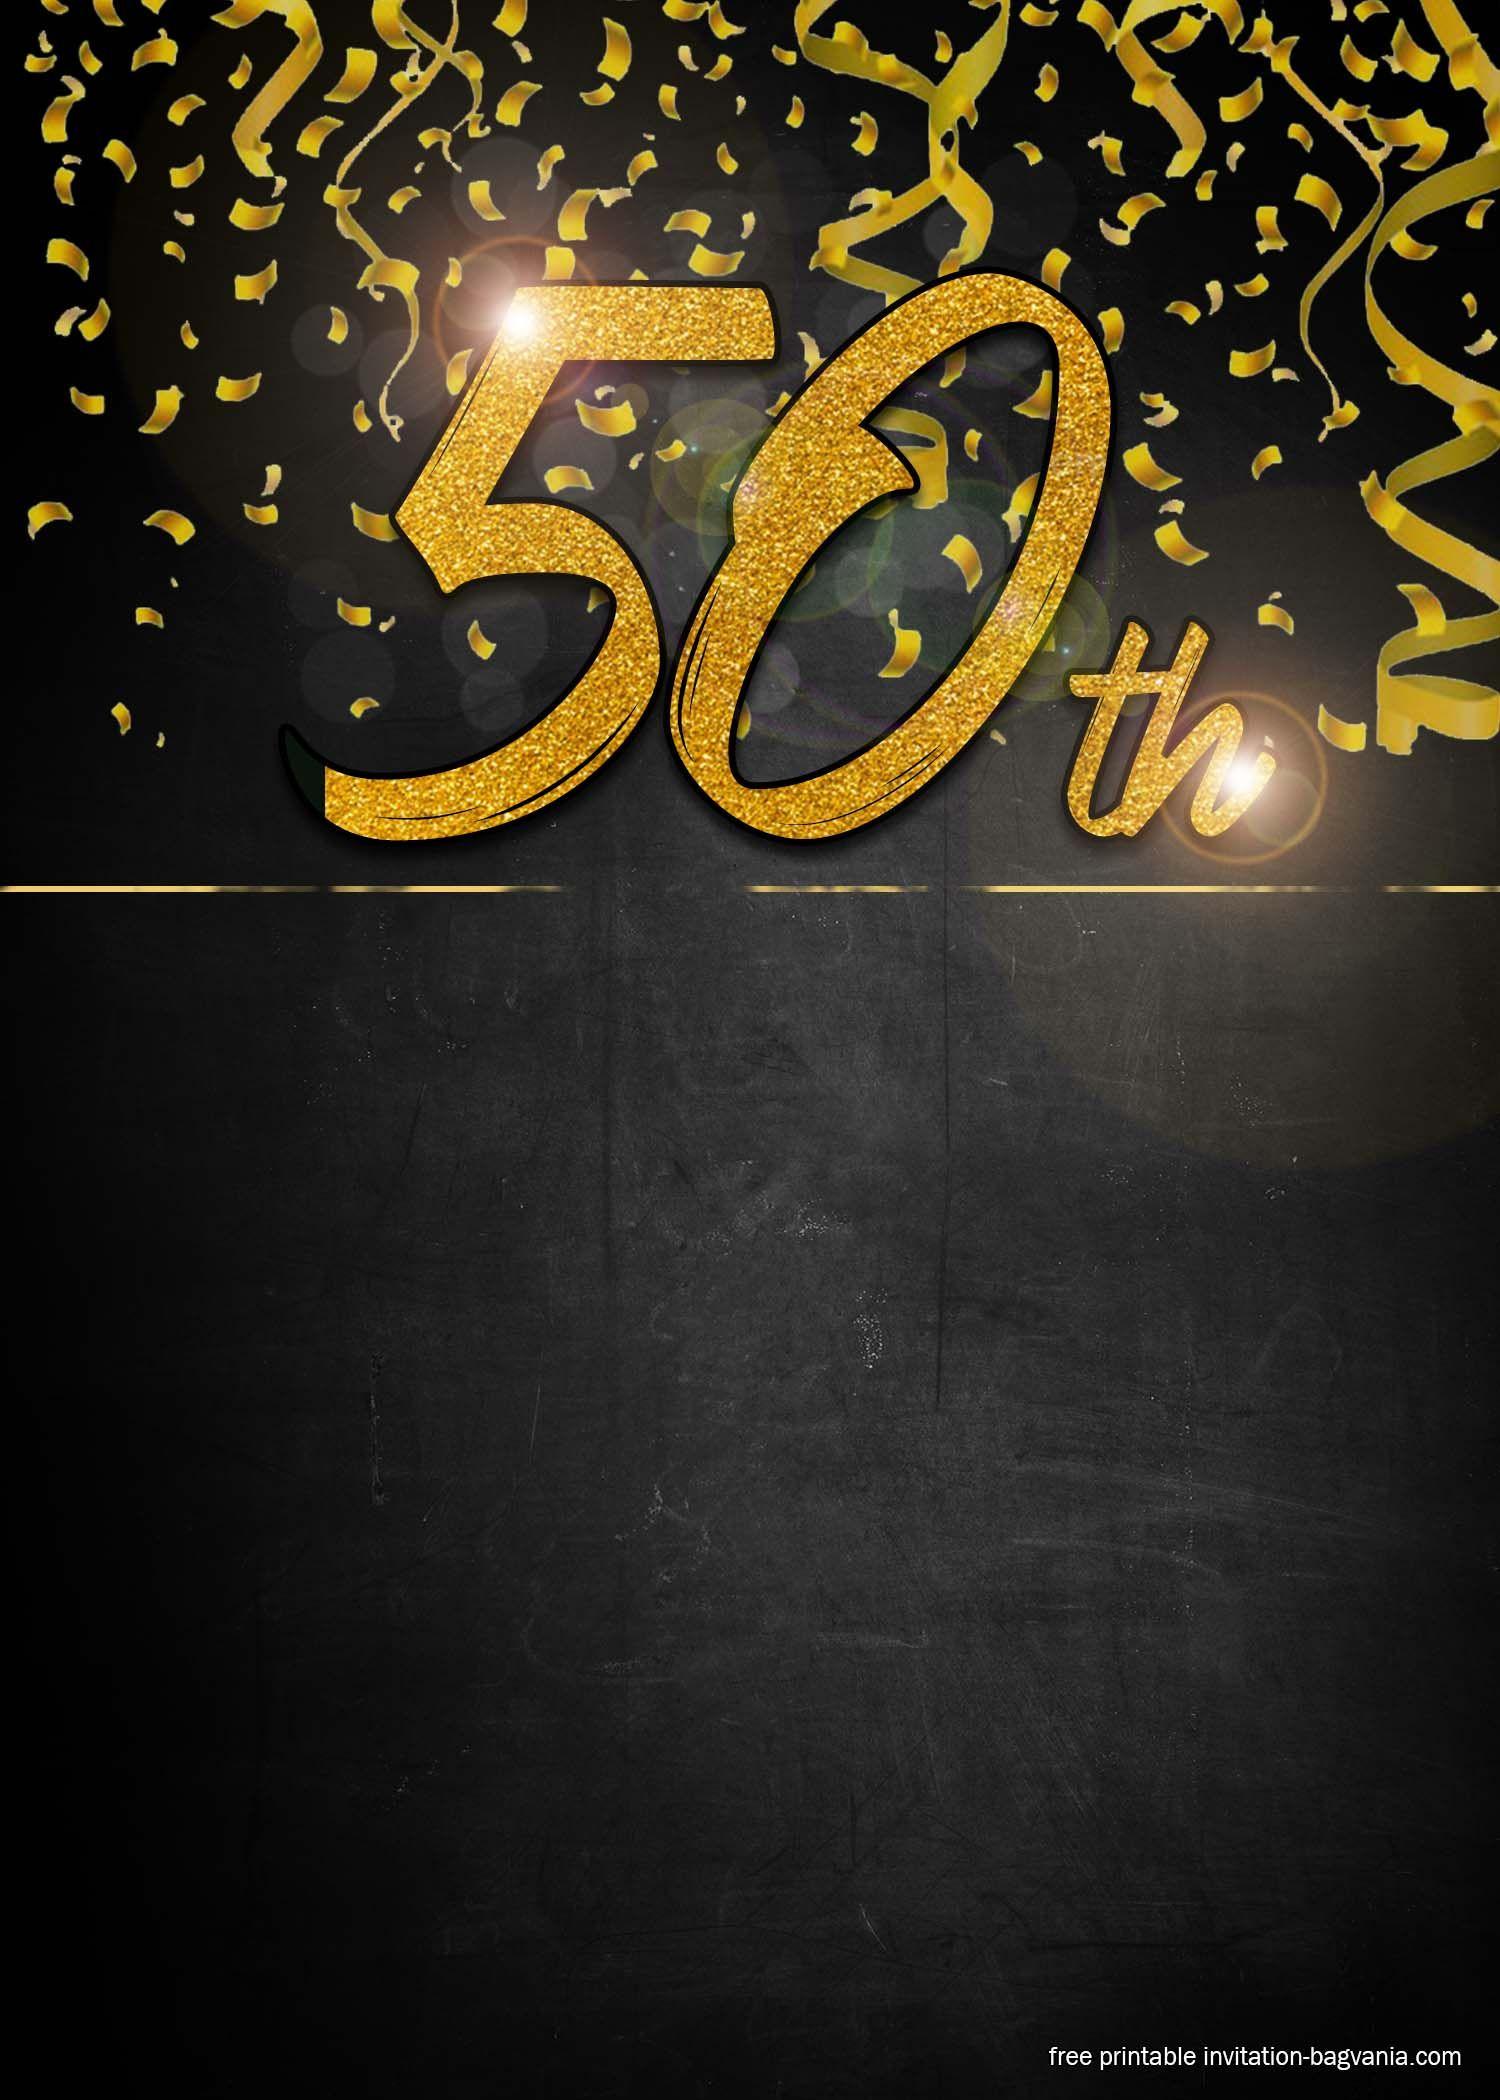 FREE 50th Golden Invitation Templates for Men Printable